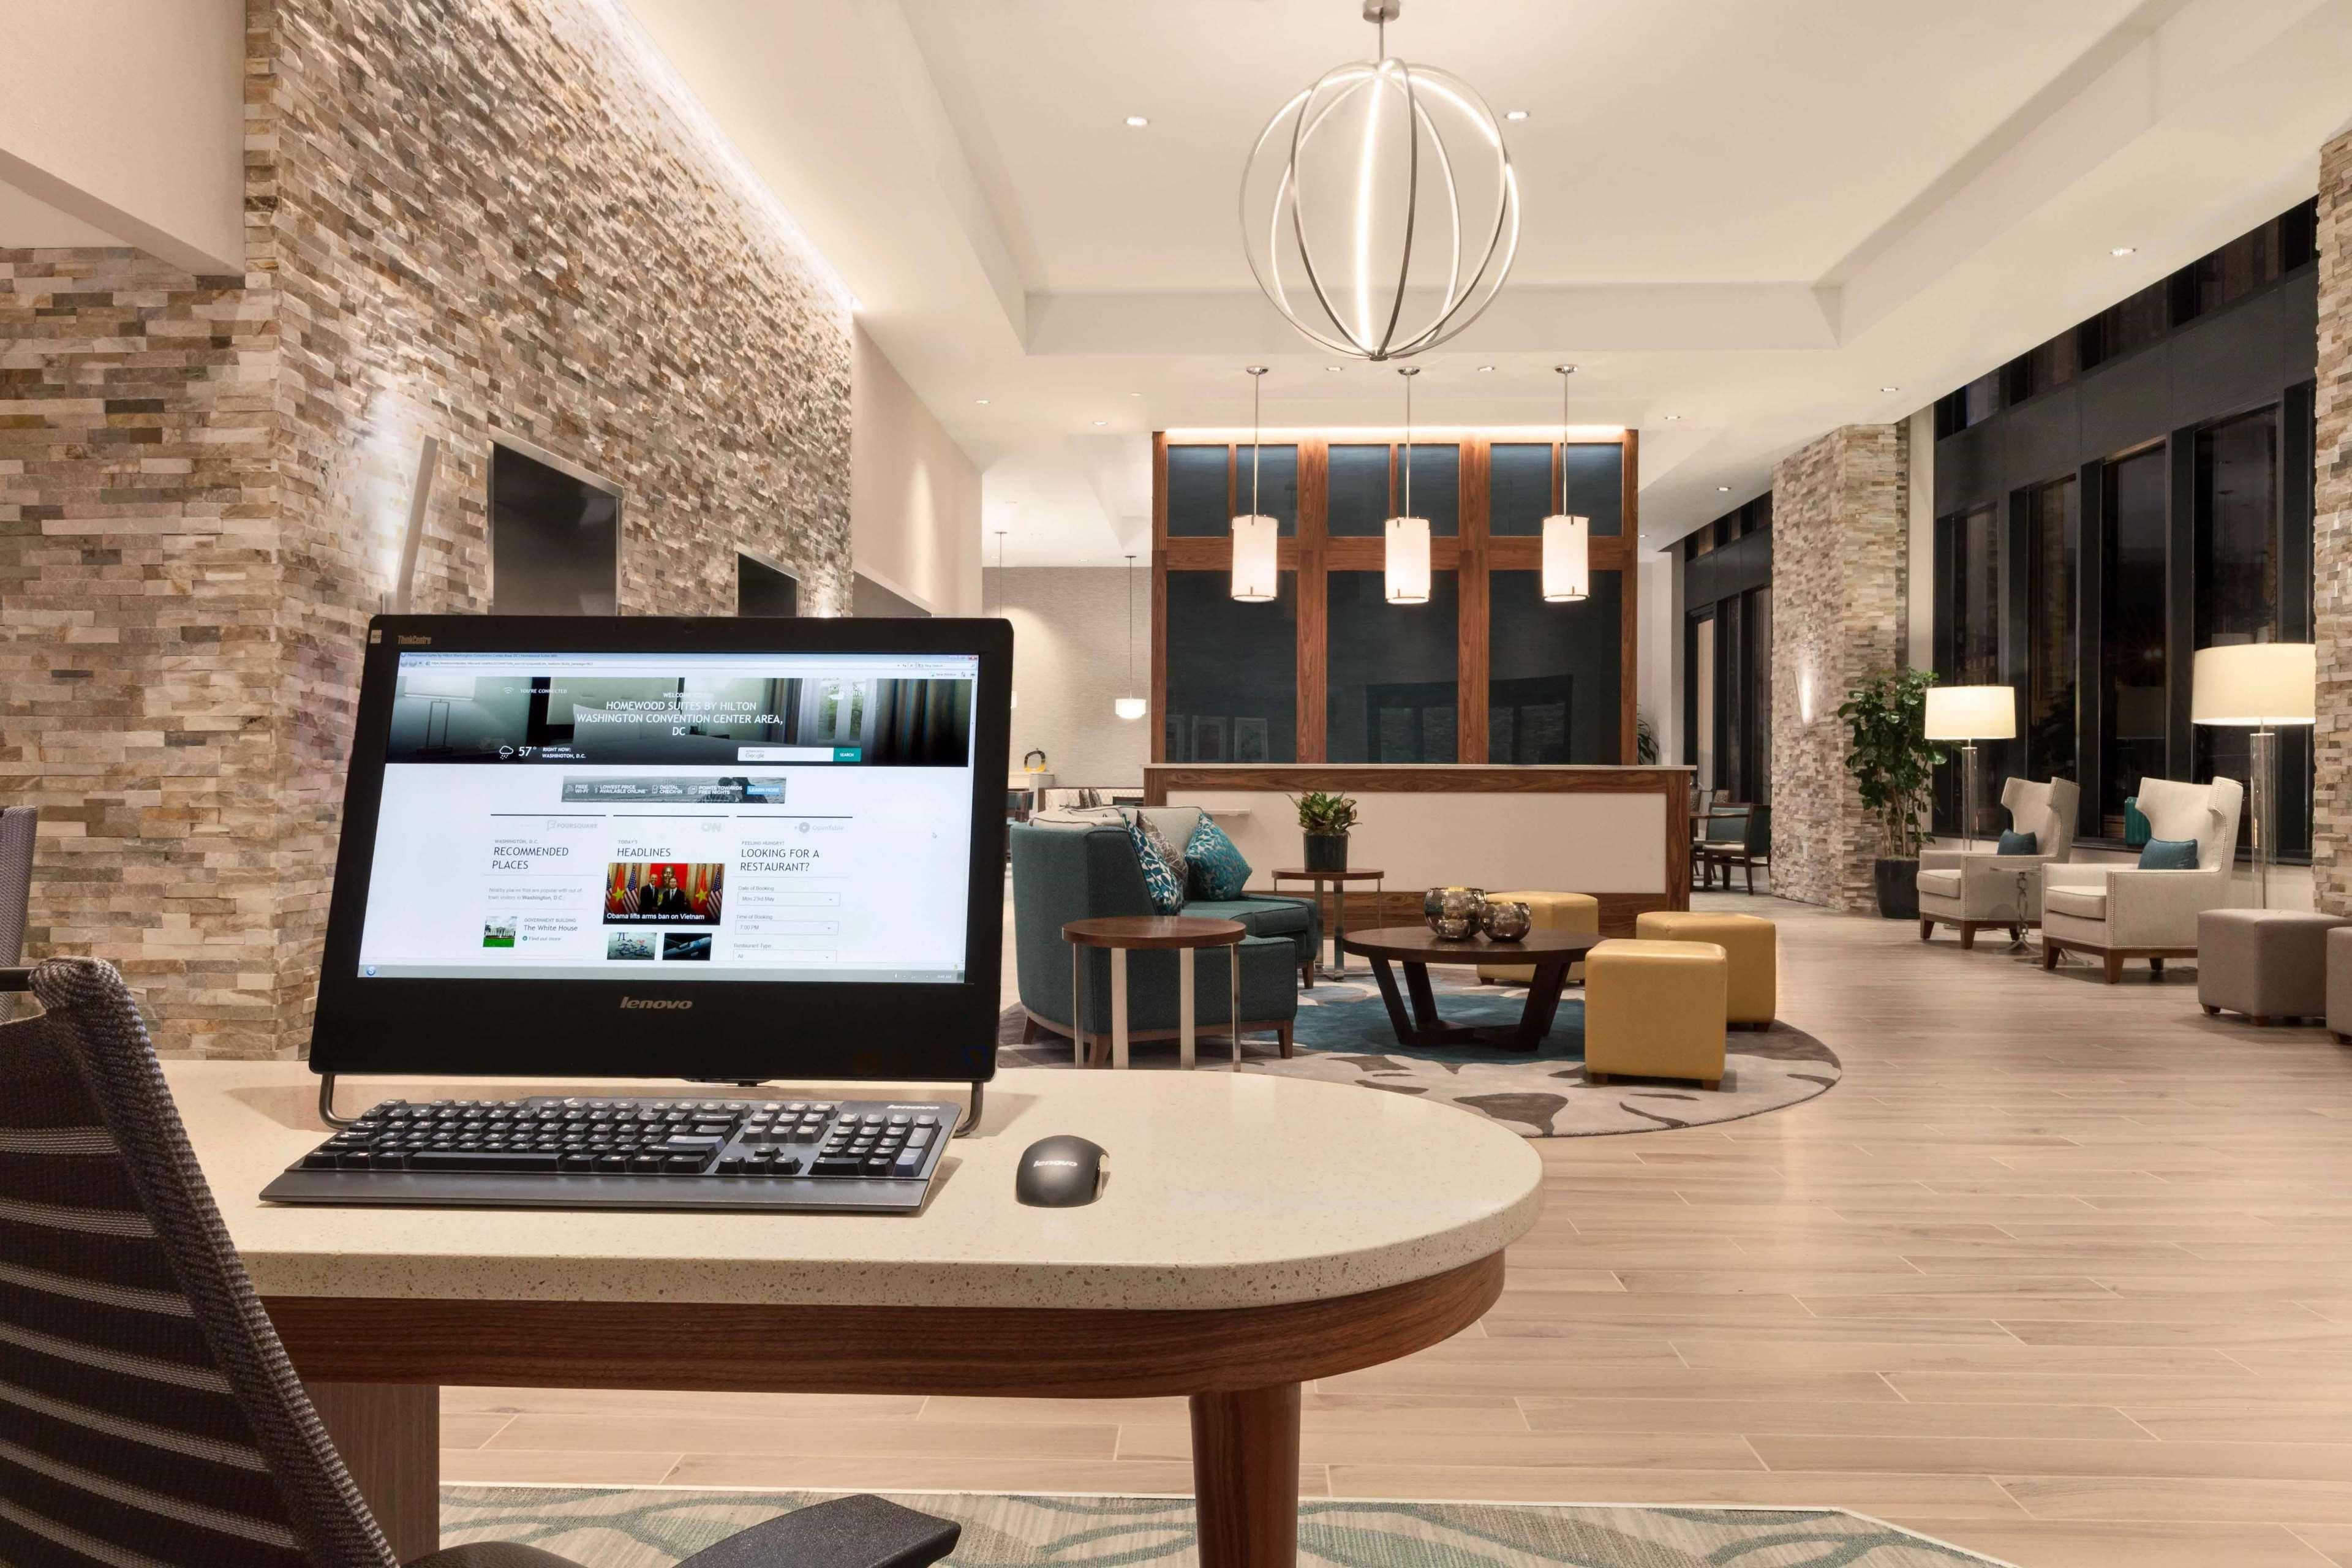 Homewood Suites by Hilton Washington DC Convention Center image 4